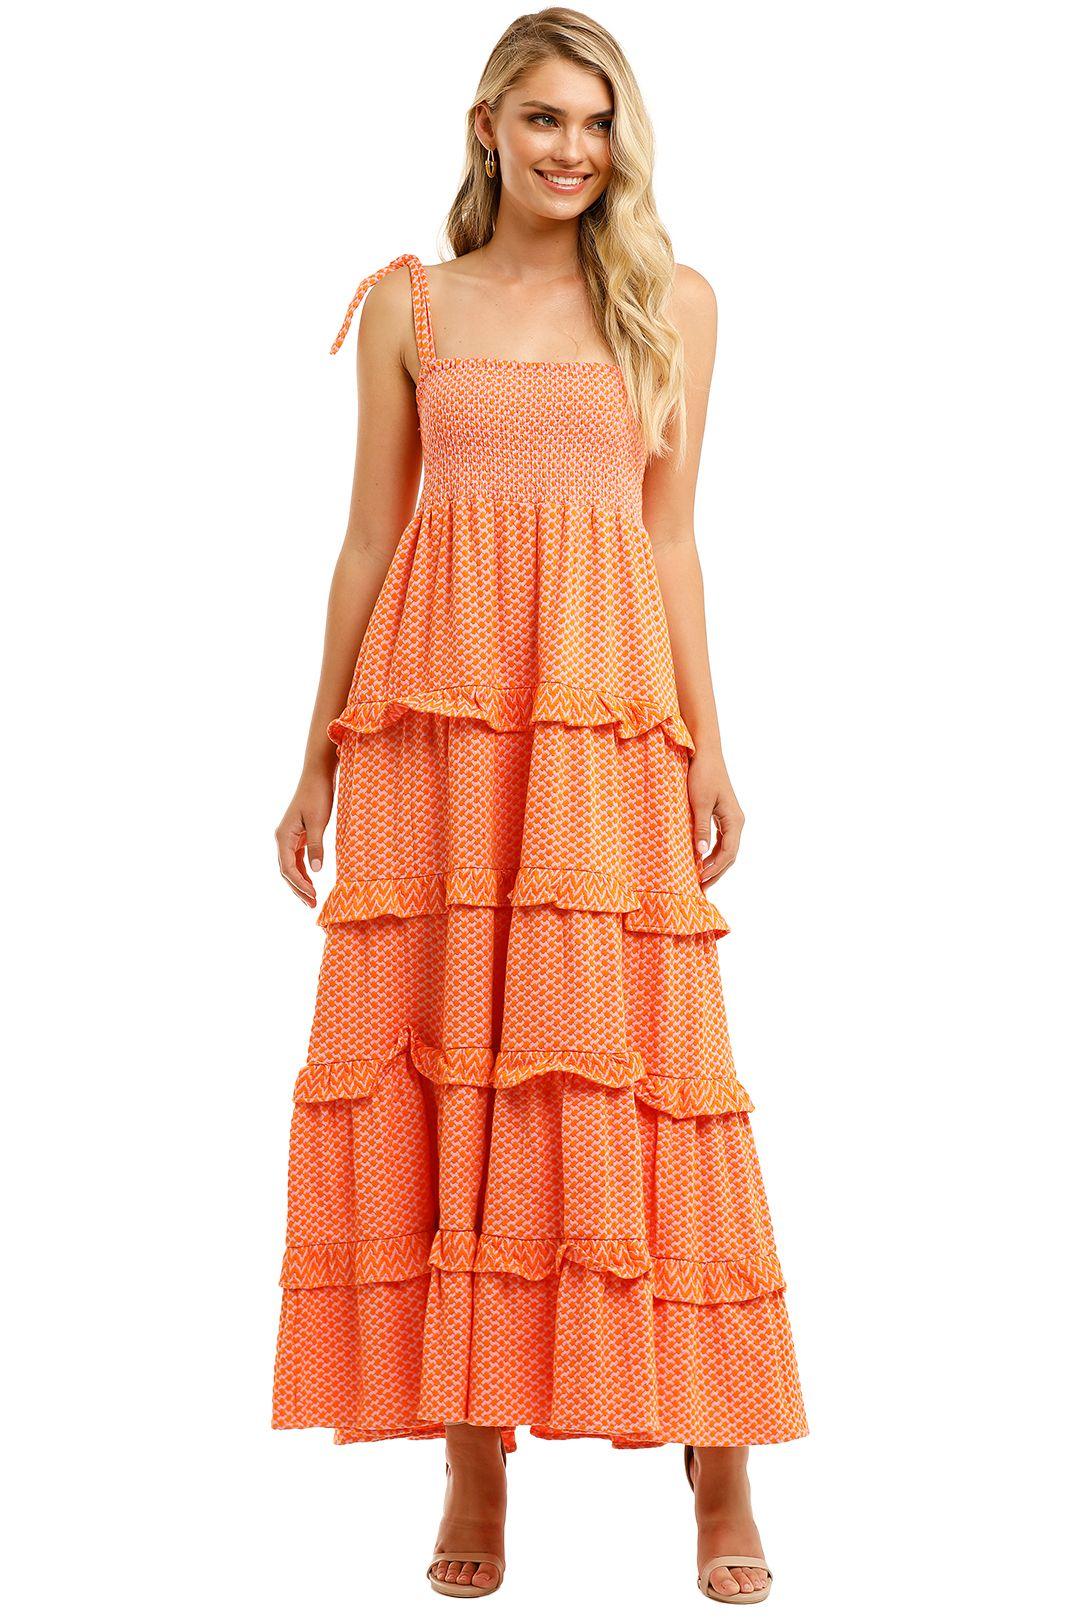 Cecilie-Copenhagen-Mina-Maxi-Dress-Orange-Front